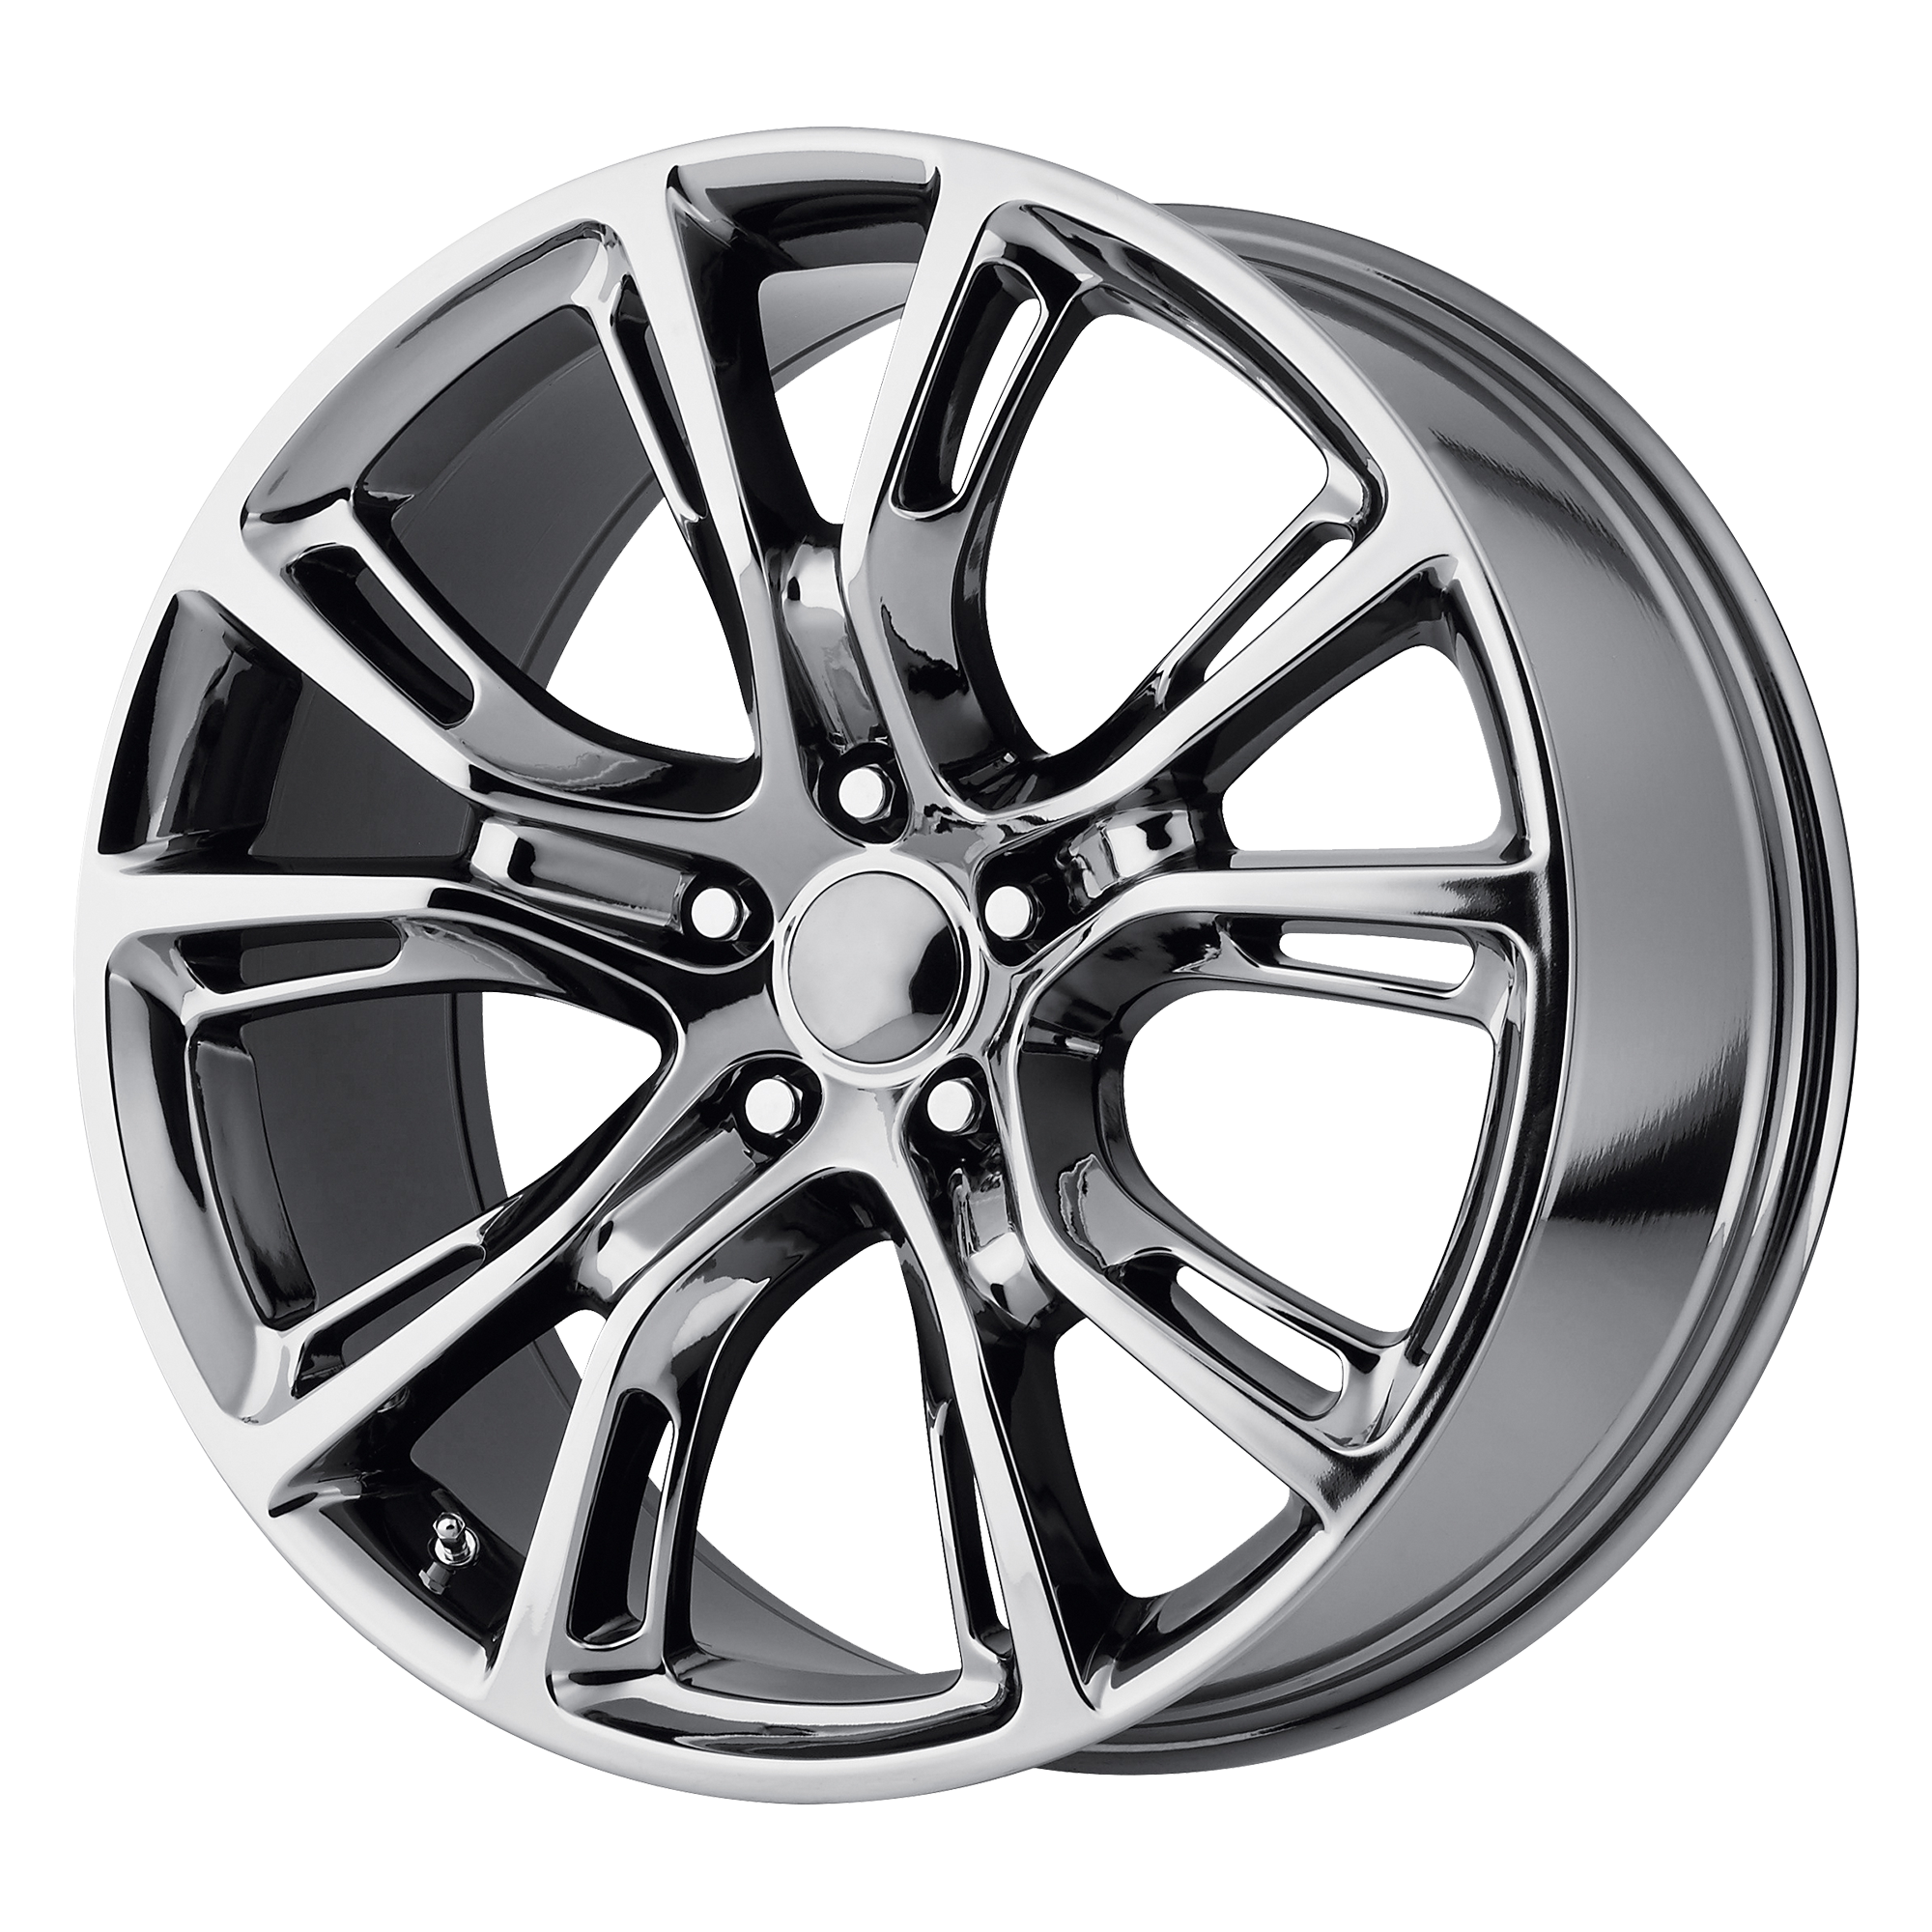 OE Creations Replica Wheels OE Creations PR137 PVD Black Chrome